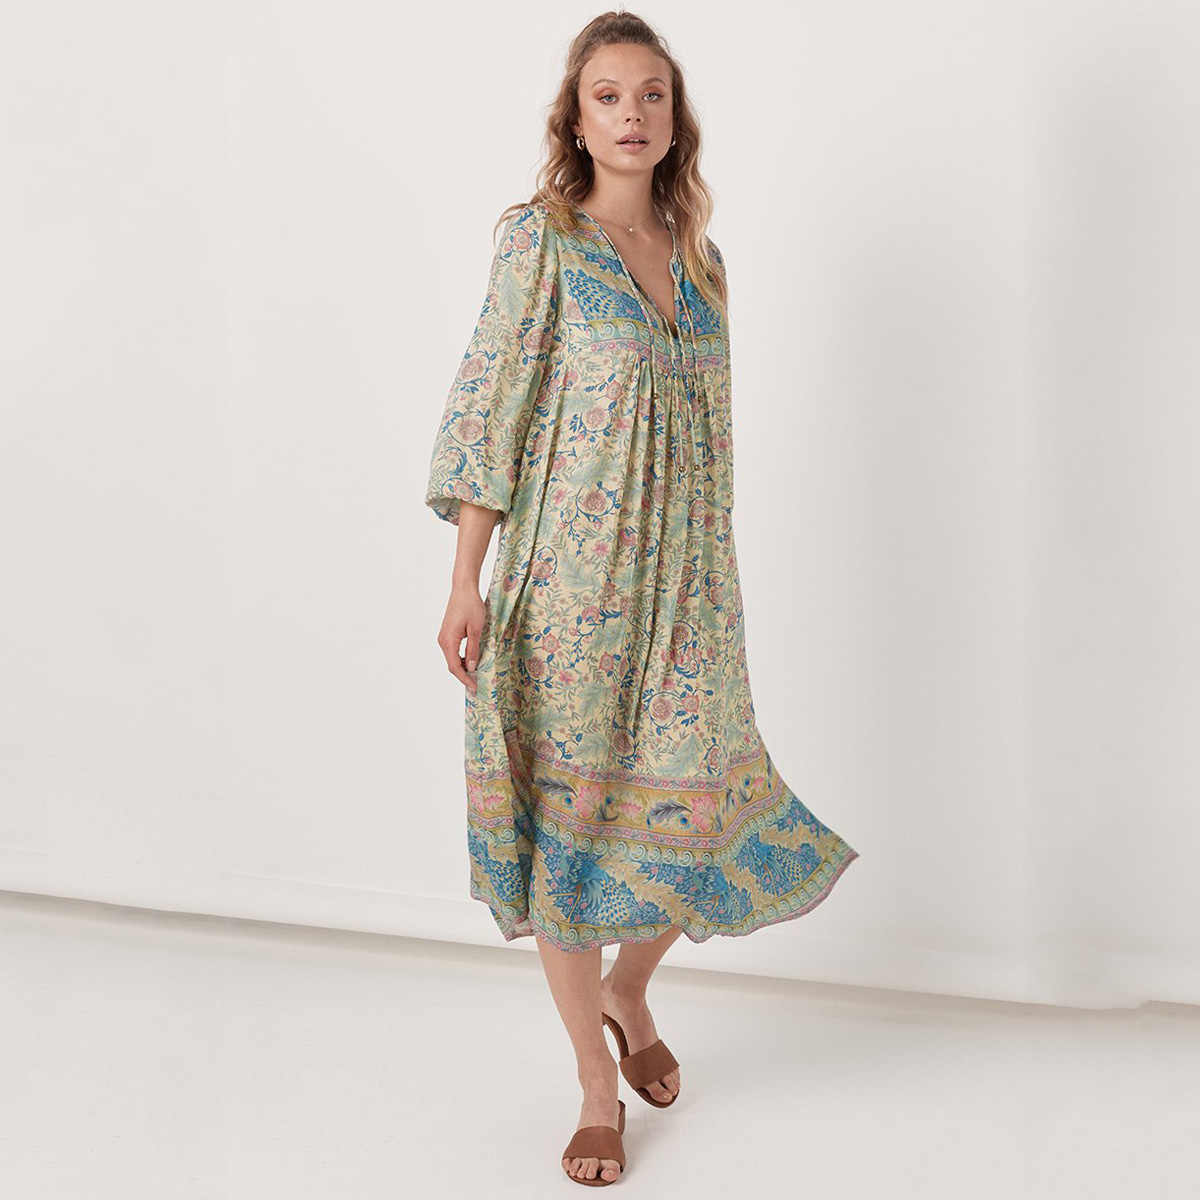 1c5d9b6561a96 Gypsy Style Print Dress Vintage Oasis Boho Maxi Dresses Casual Beach Long  Dress V-Neck Long Sleeve Women Dresses Vestidos 2019